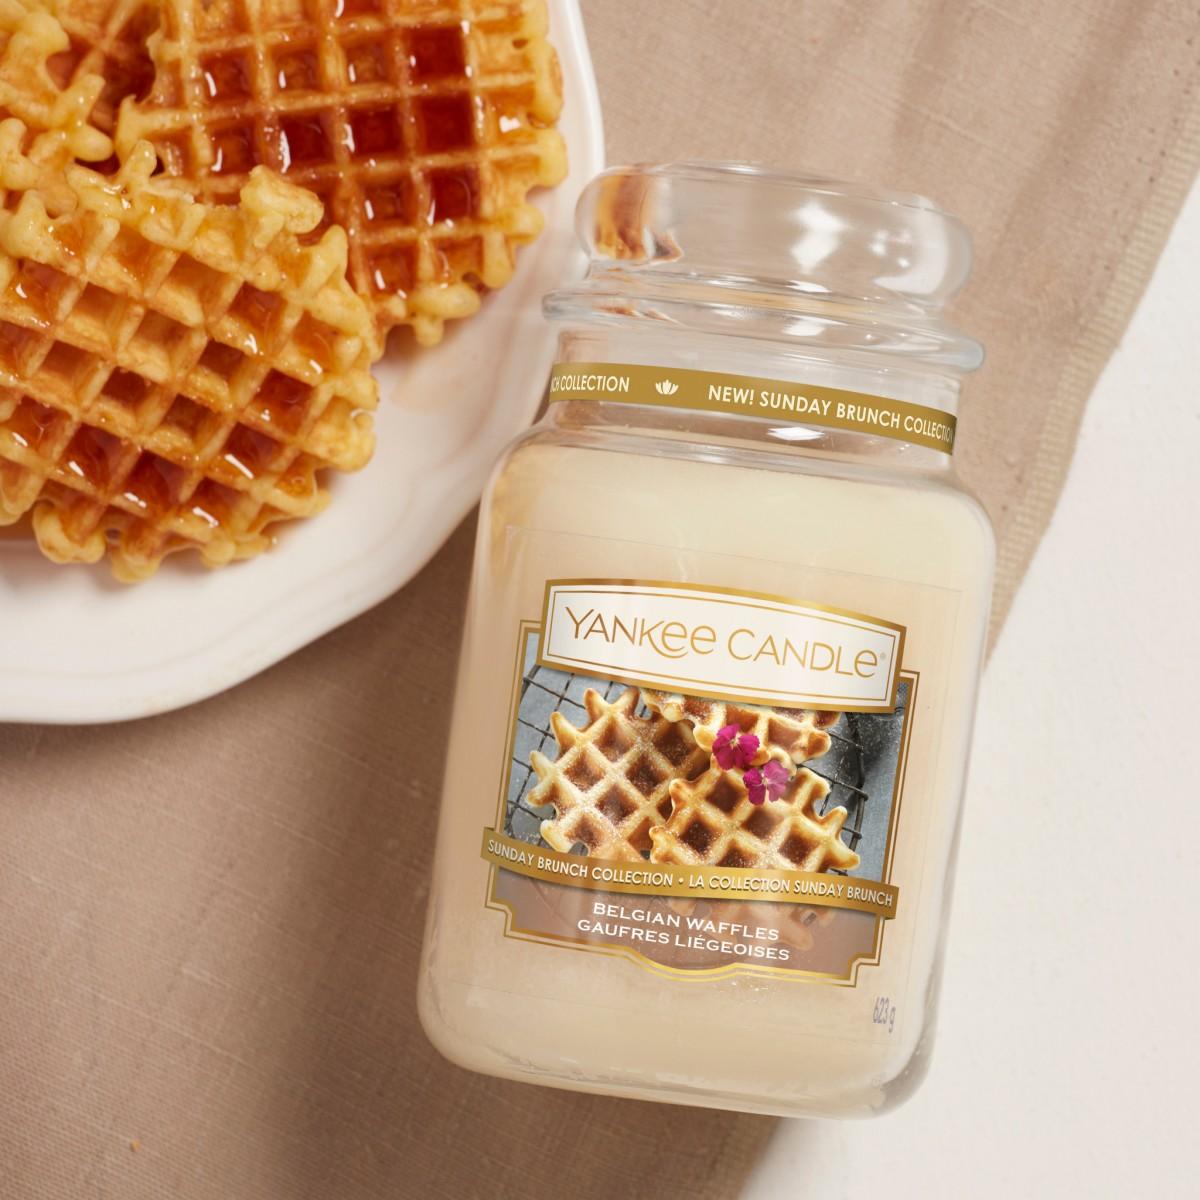 belgian-waffles-bougies-jarres